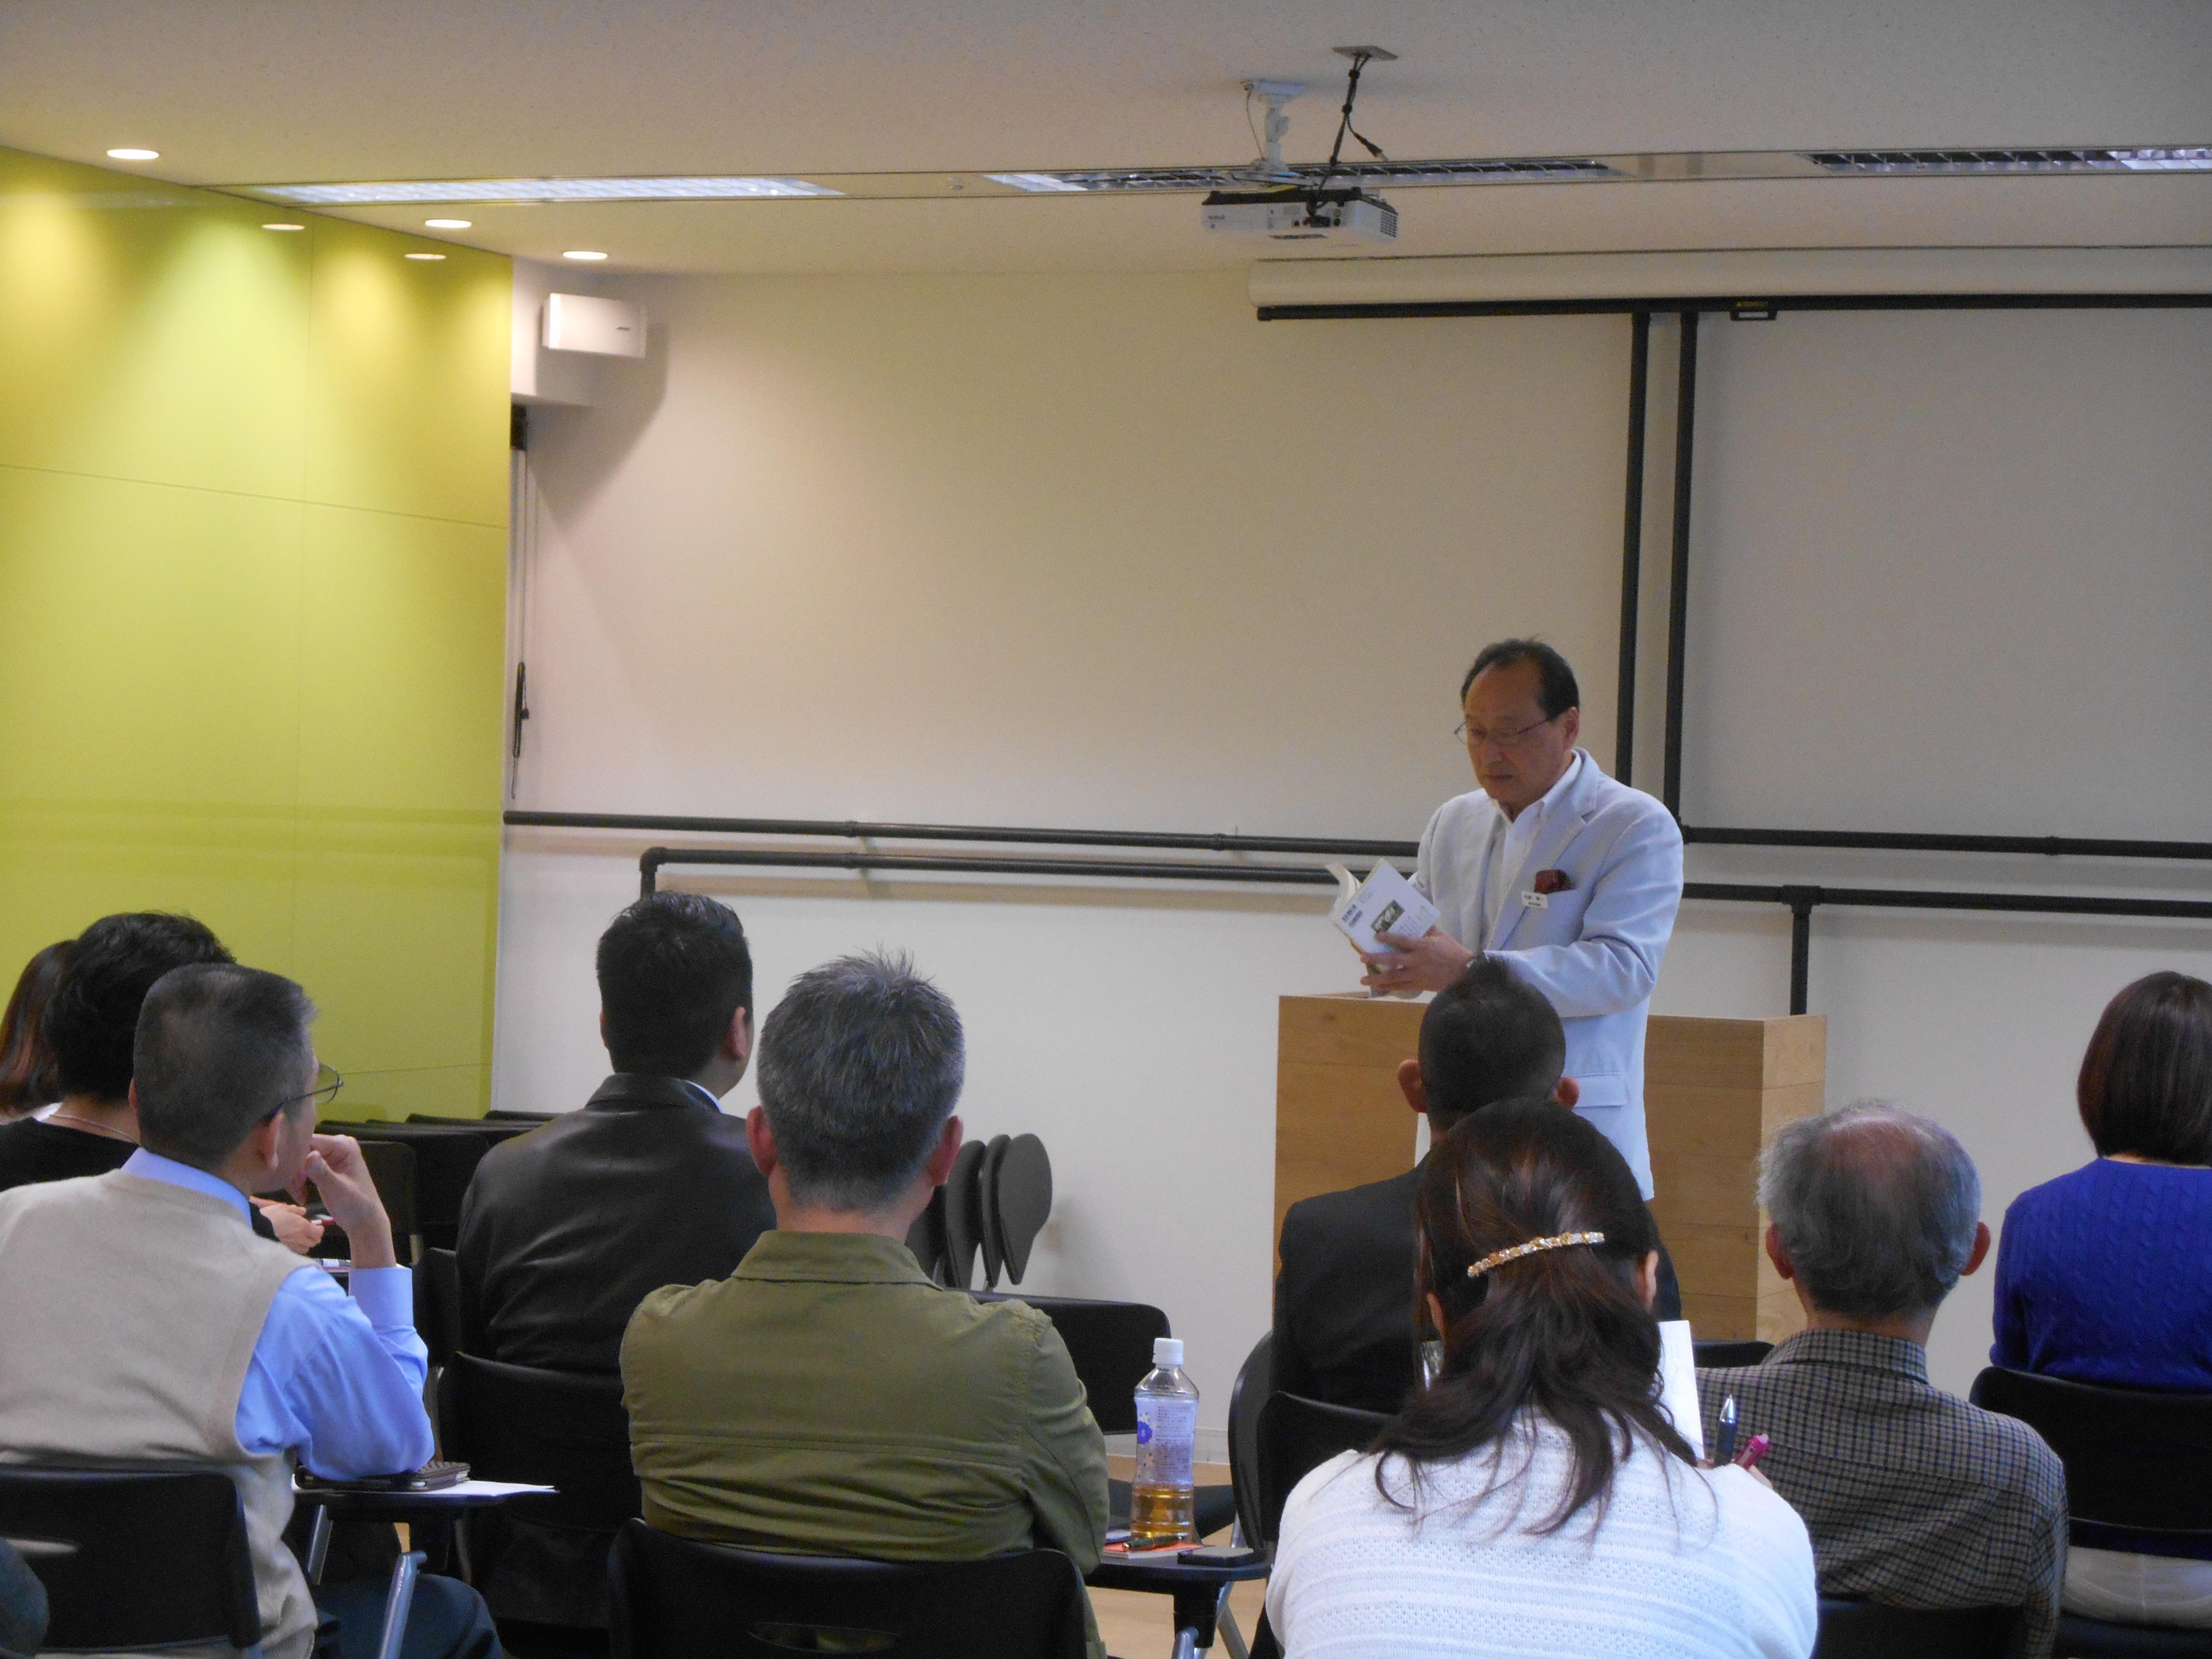 DSCN3712 1 - 4月1日東京思風塾の開催になります。